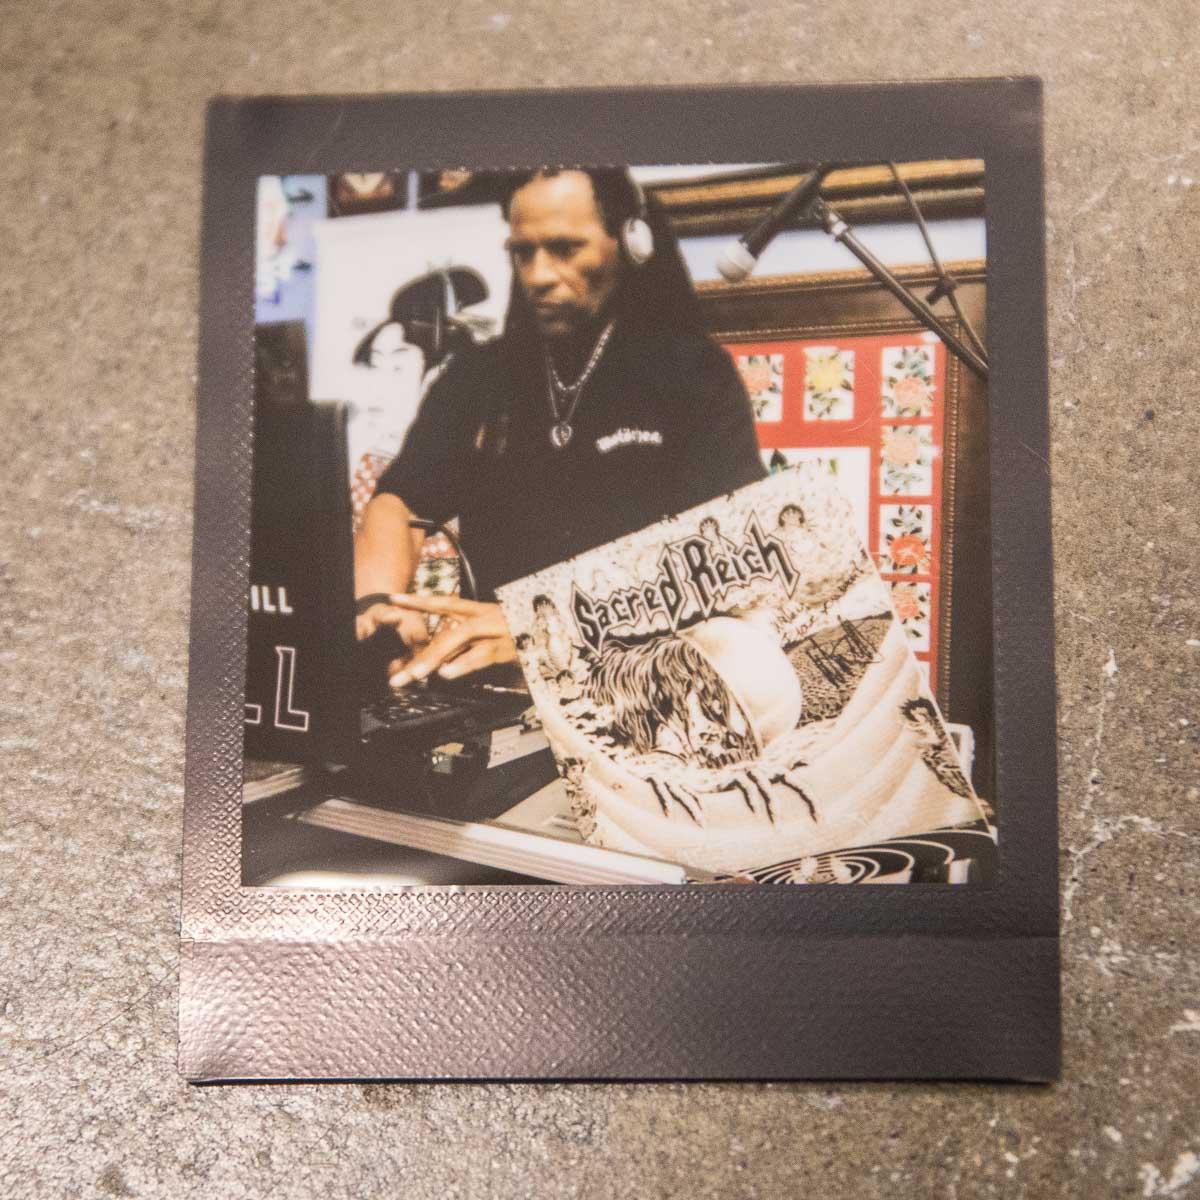 DJ Will spinning the tune